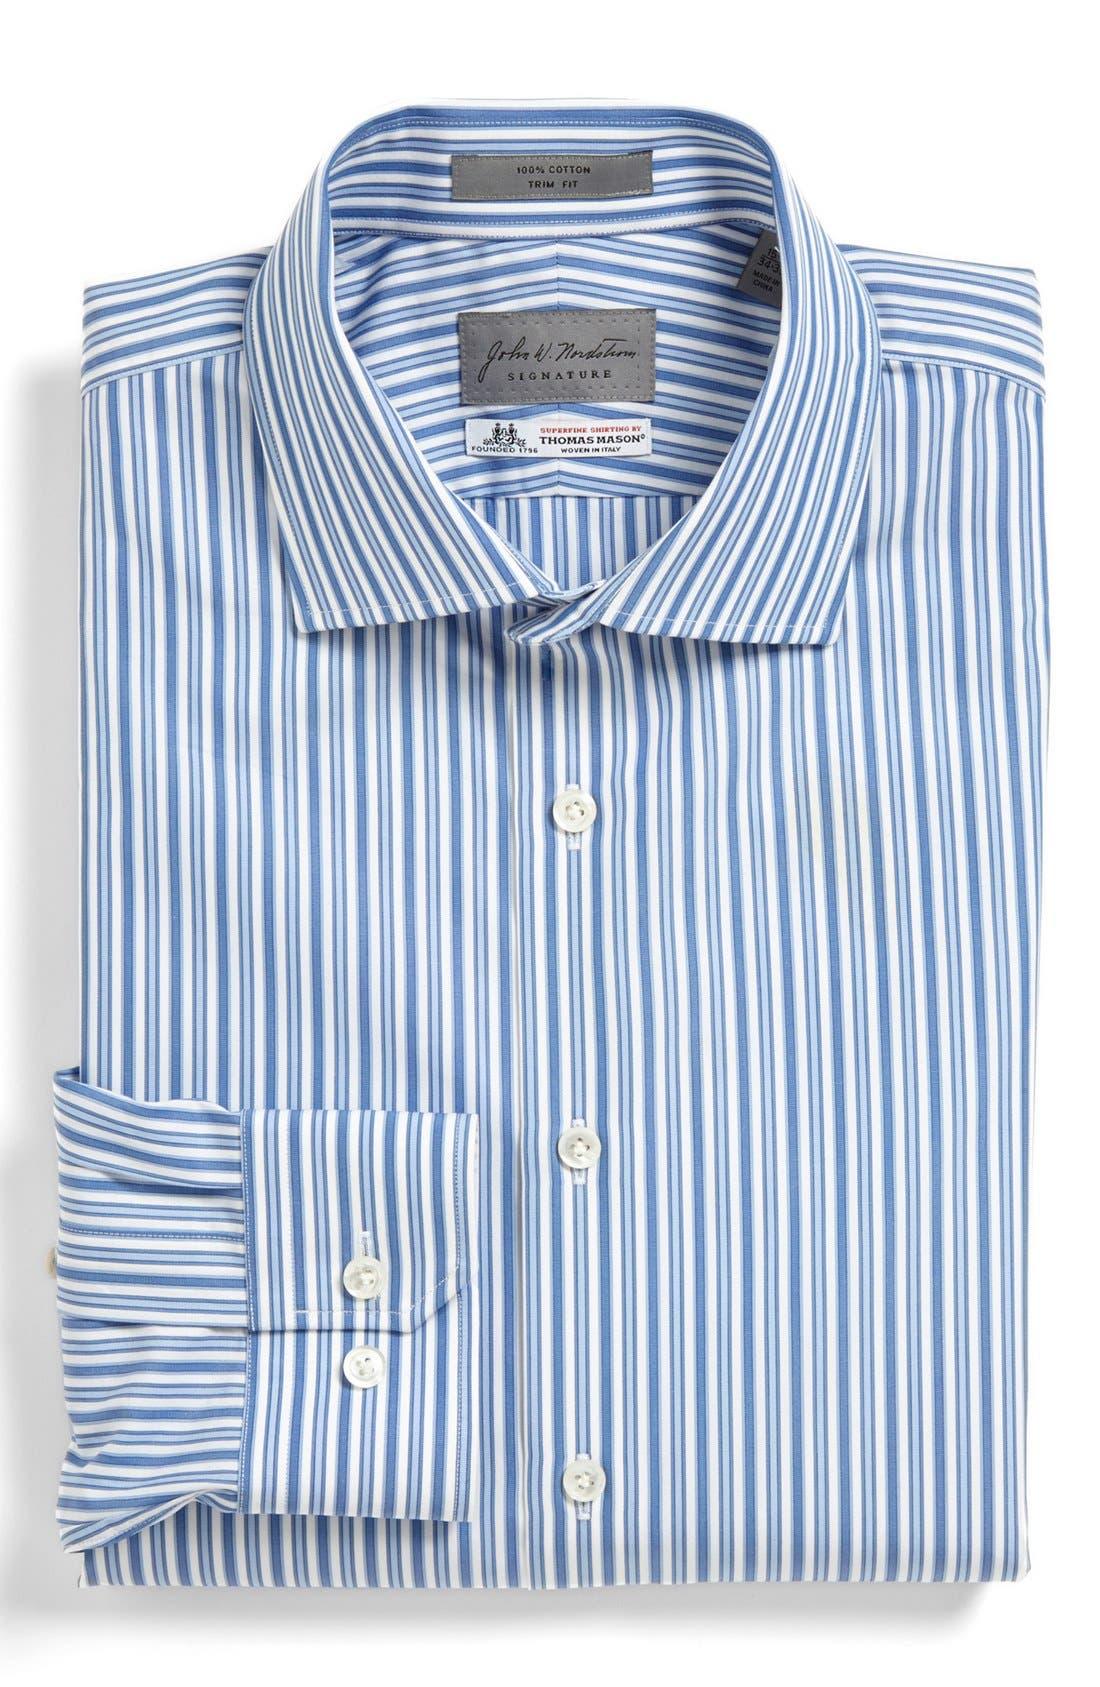 Main Image - John W. Nordstrom® Signature Trim Fit Stripe Dress Shirt